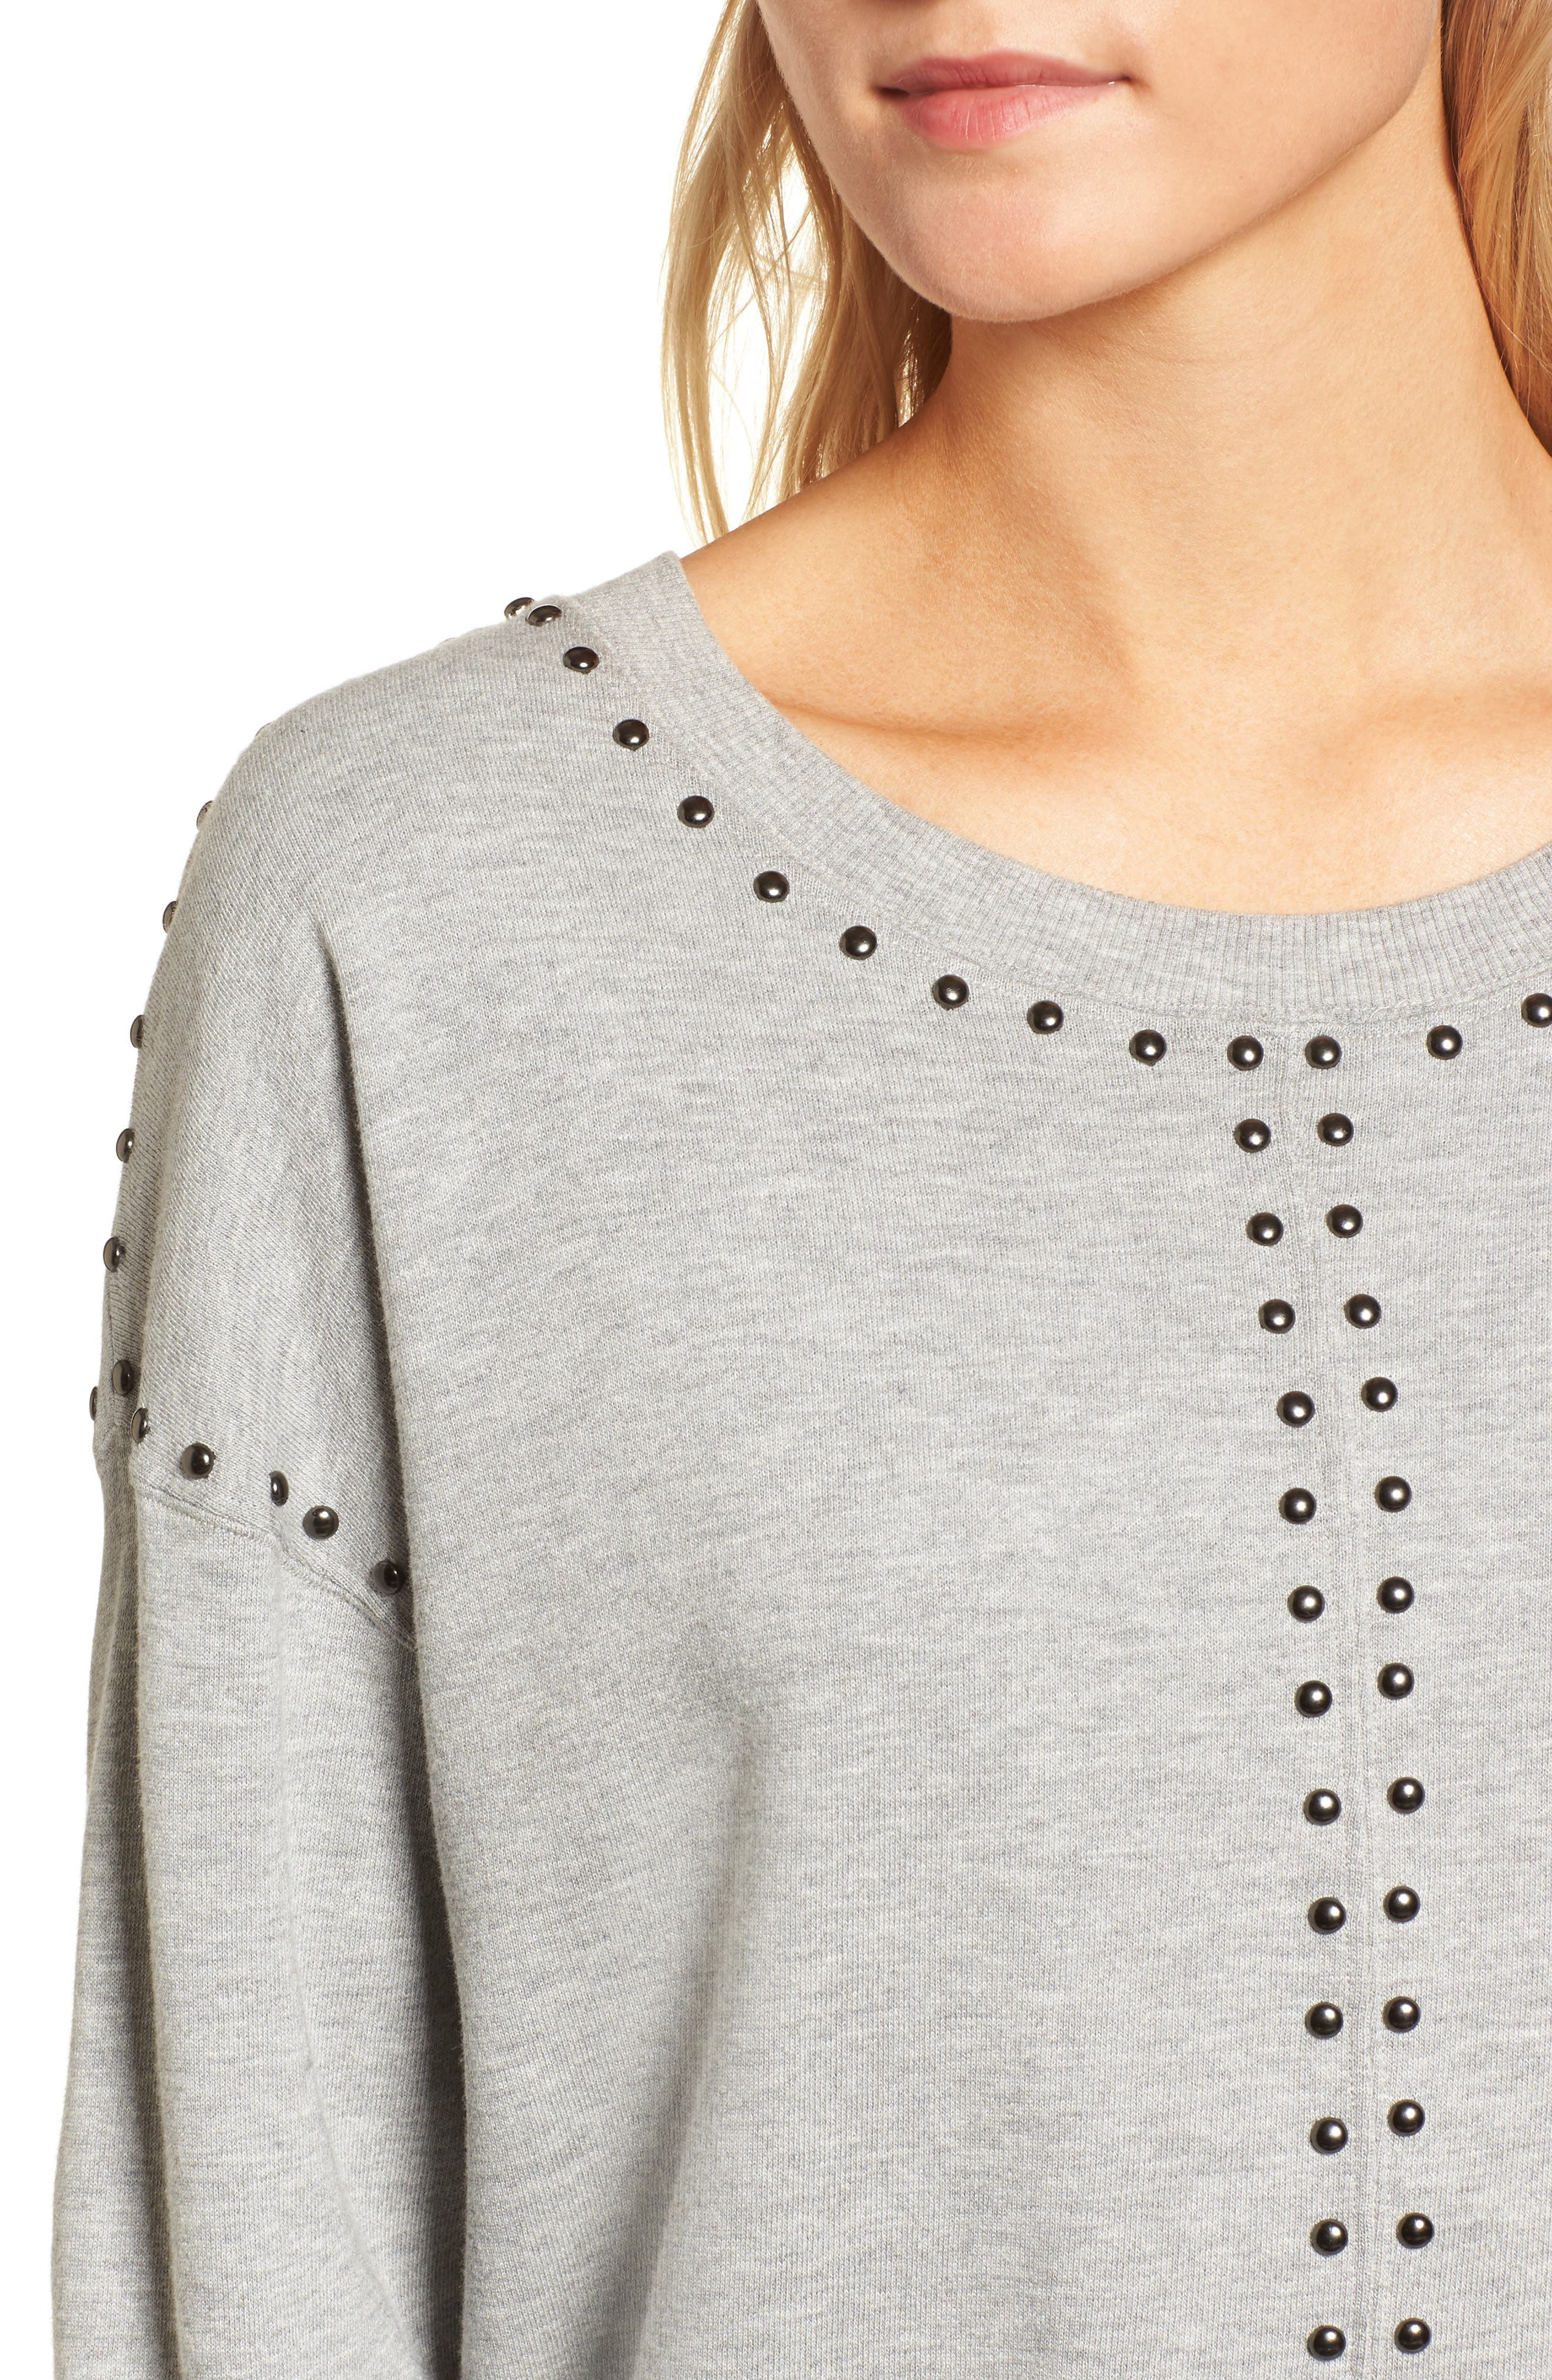 Wilson Studded Sweatshirt,                             Alternate thumbnail 4, color,                             Heather Grey